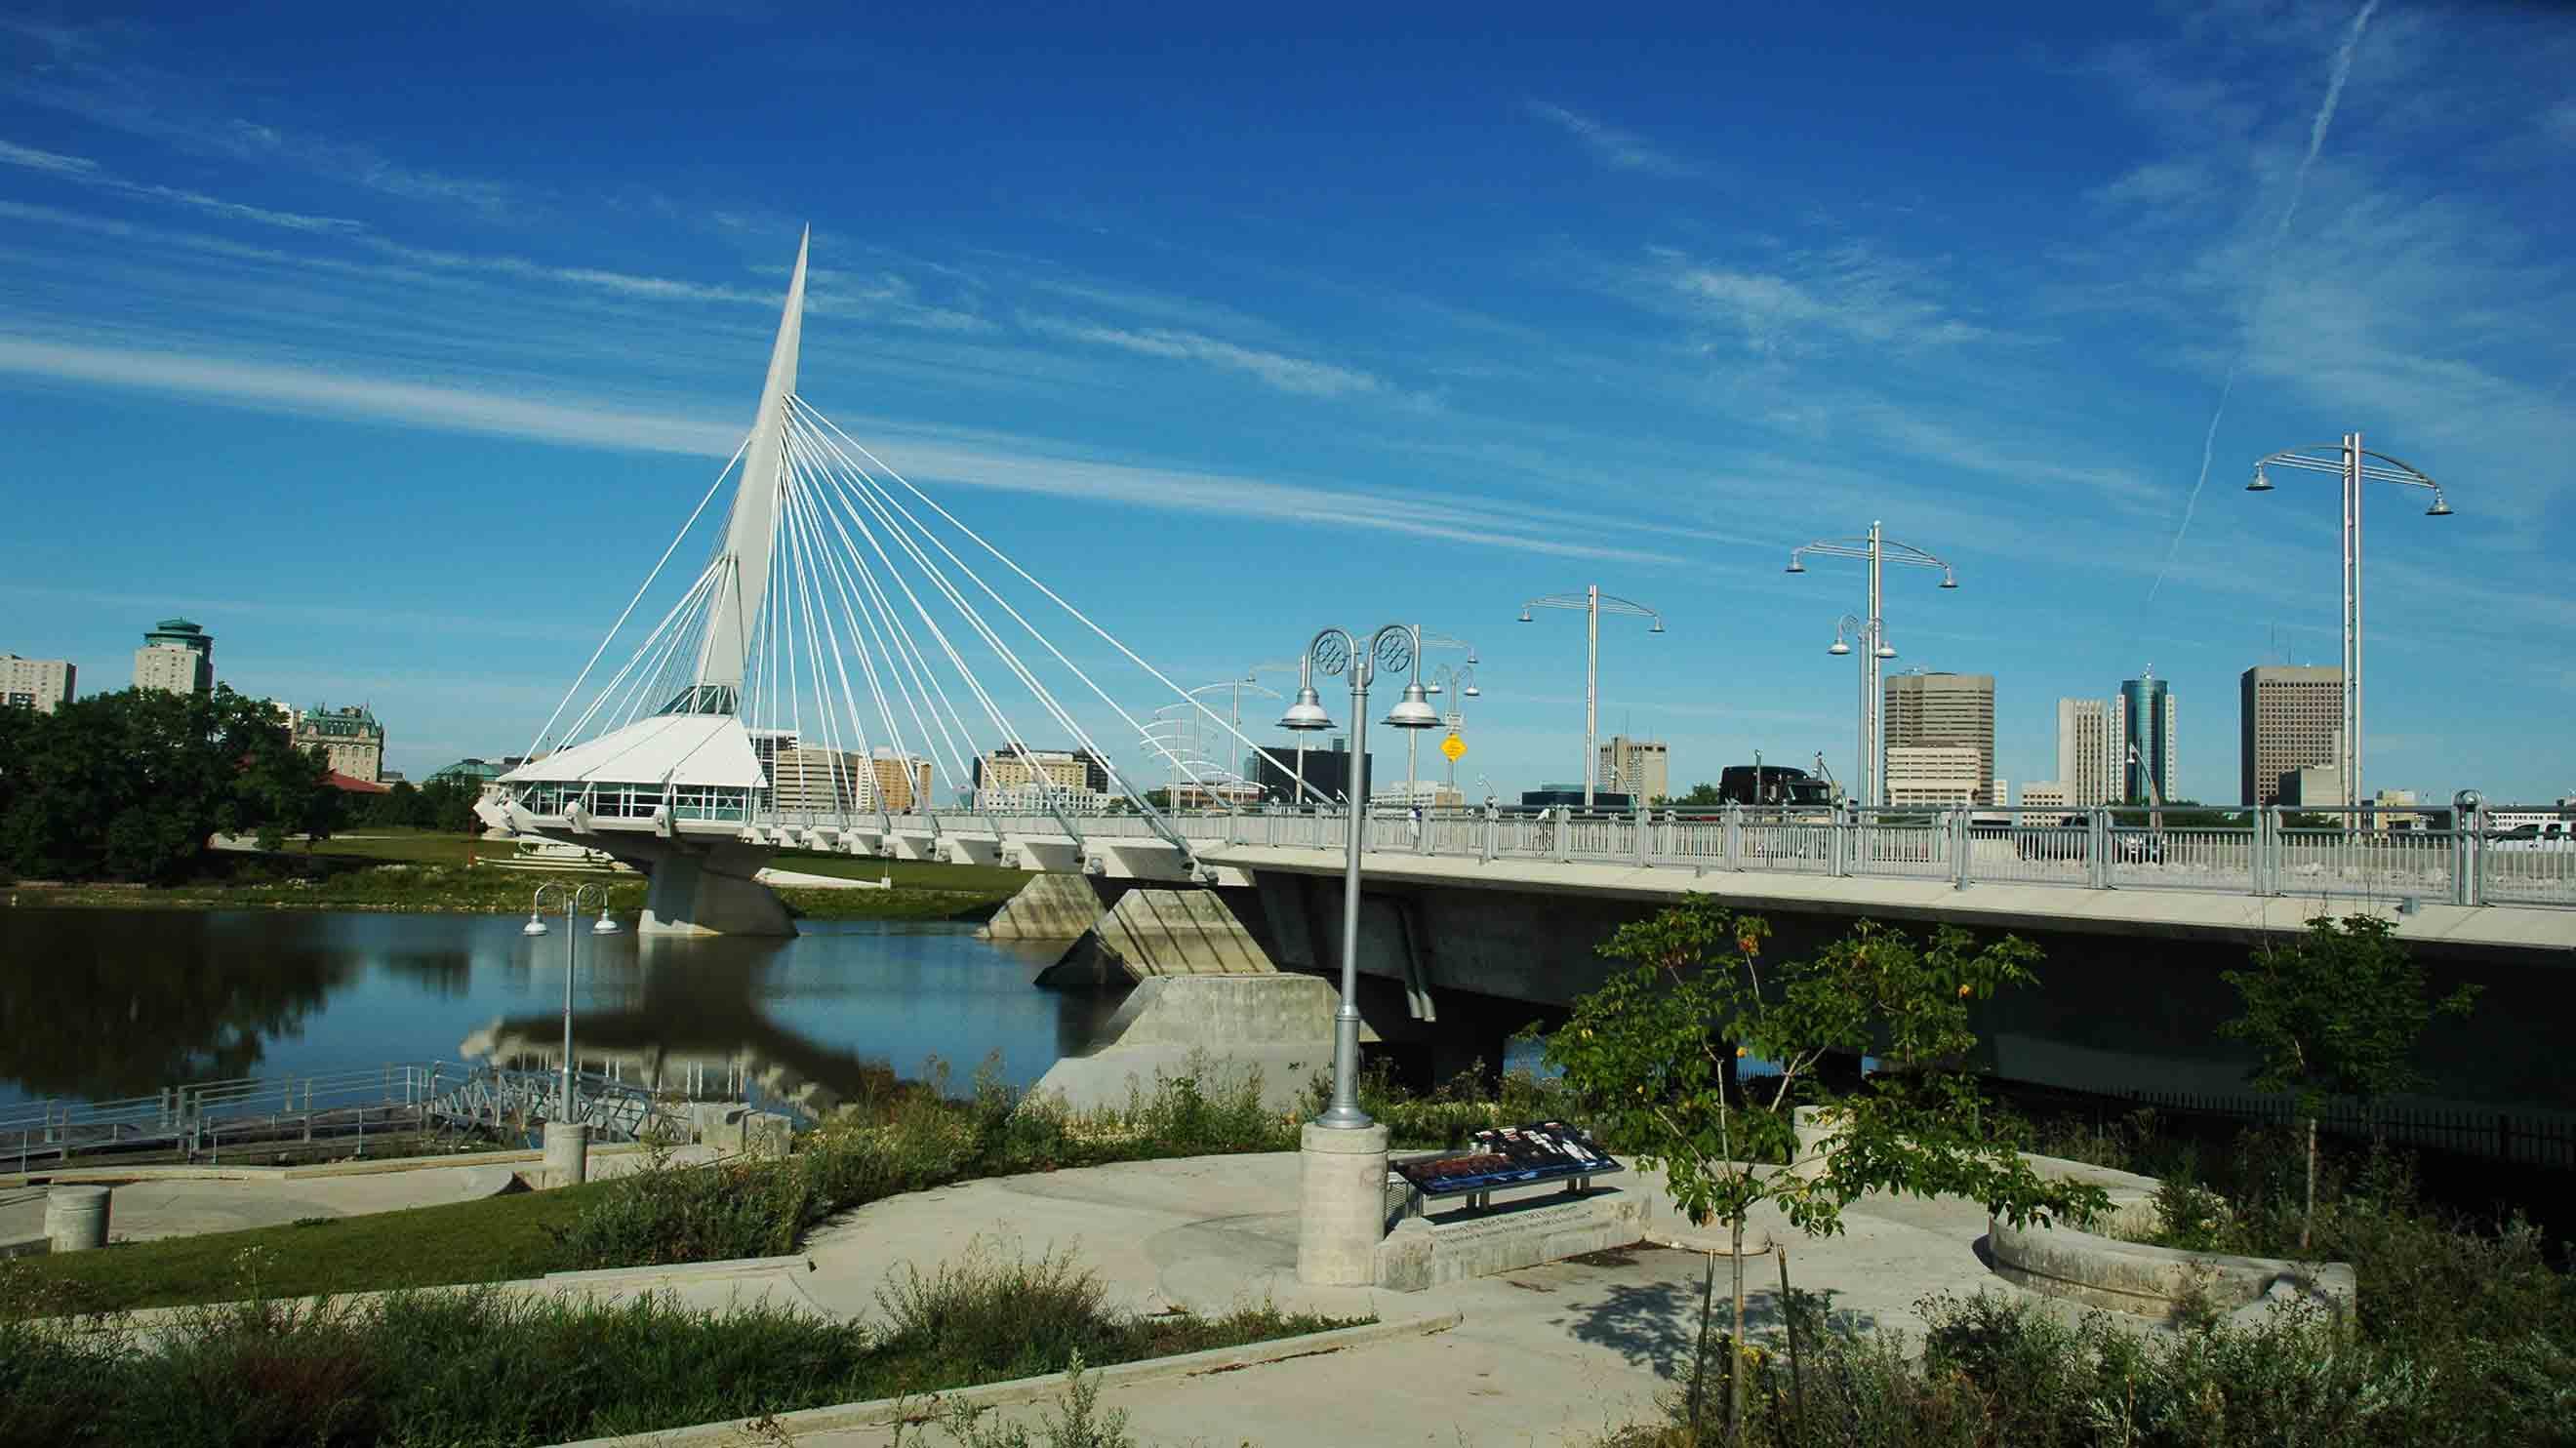 Winnipeg Car Rental: Find Cheap Rental Cars in Winnipeg, Manitoba ...